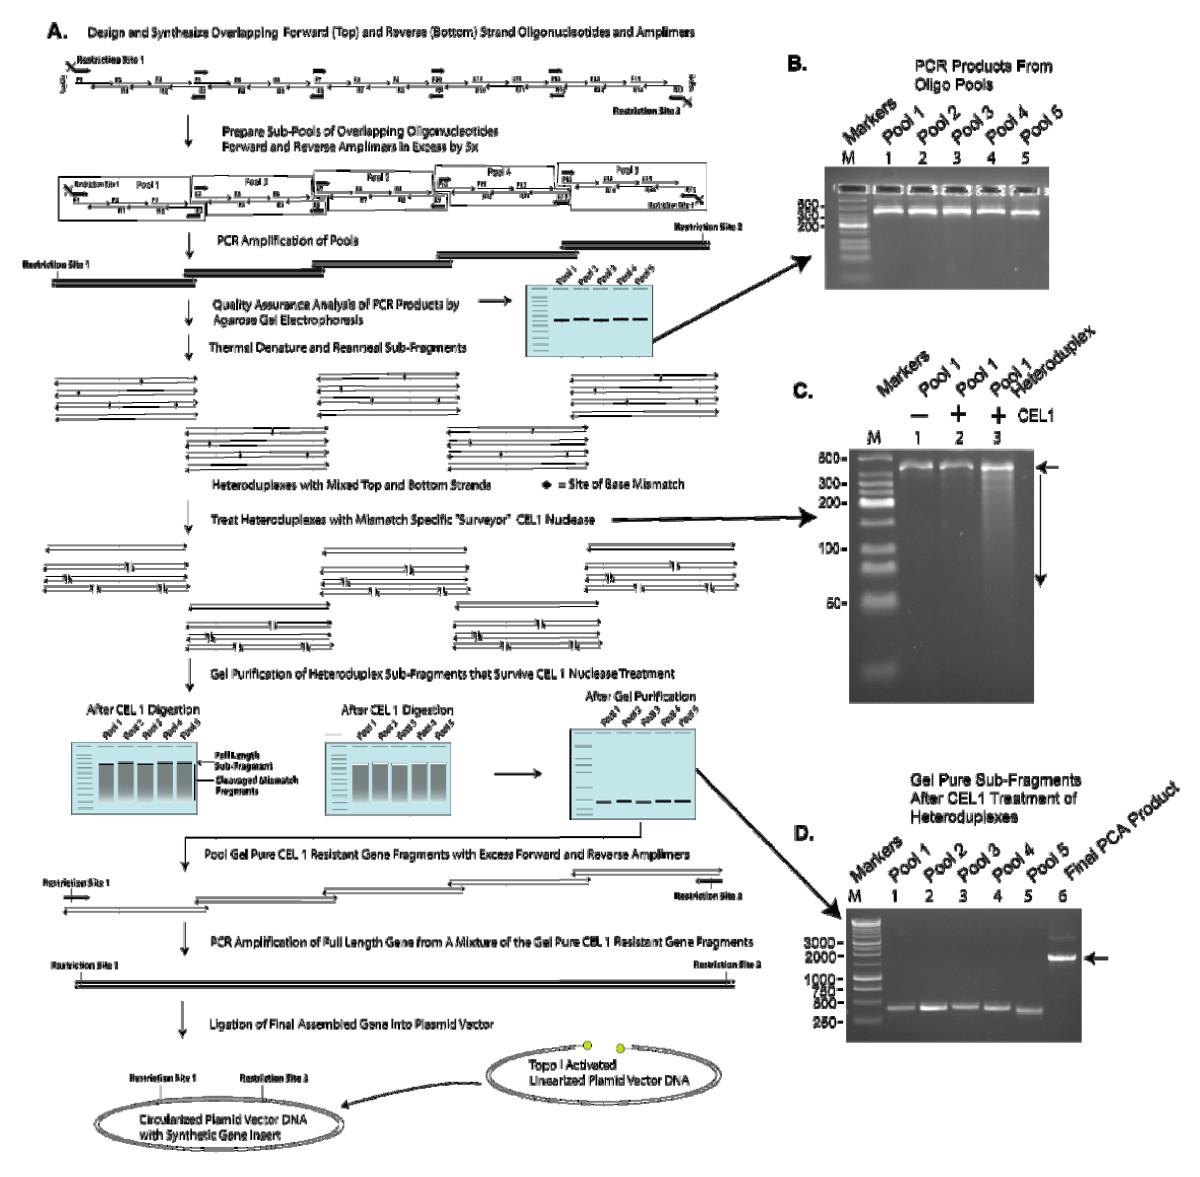 Gene Composer Database Software For Protein Construct Design Codon Pentium 4 Block Diagram Open Image In New Window